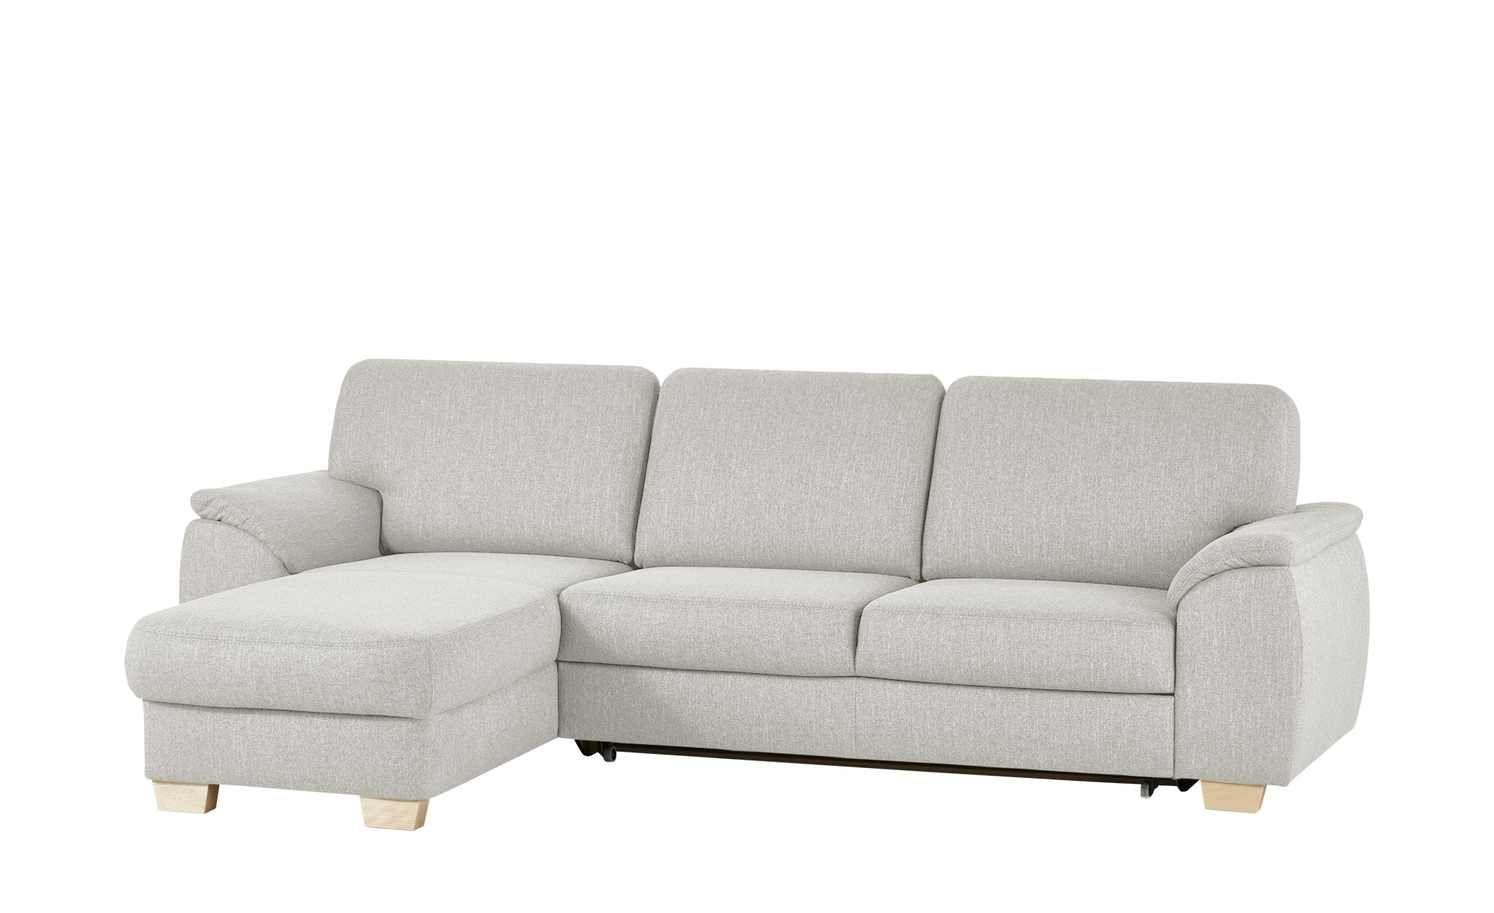 Smart Ecksofa Valencia Gefunden Bei Mobel Hoffner Sofa Ecksofa Bequeme Couch